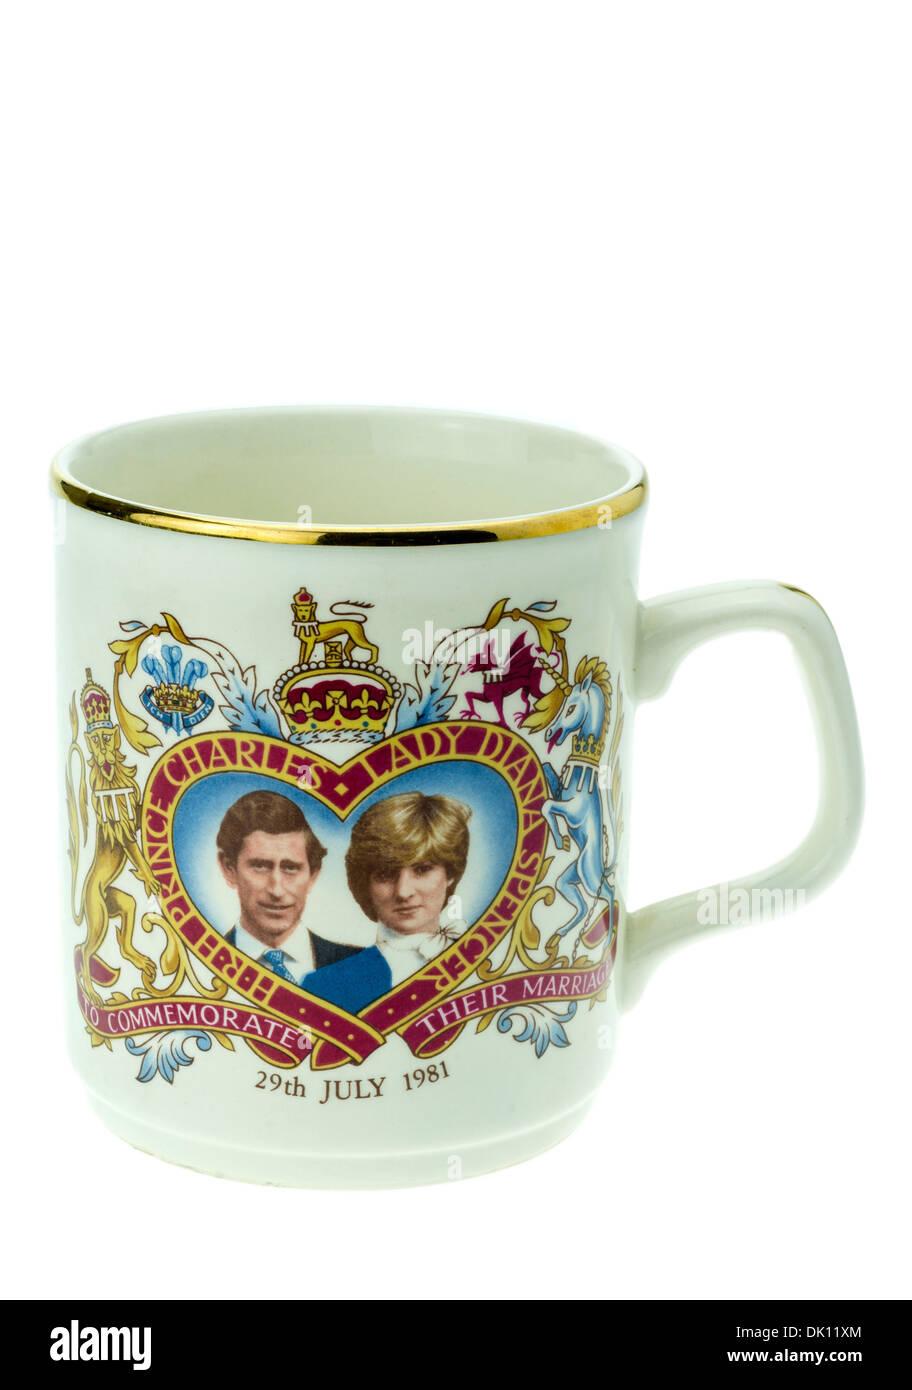 Il principe Charles e Lady Diana Spencer Commemorative Royal Wedding Day Mug. Foto Stock